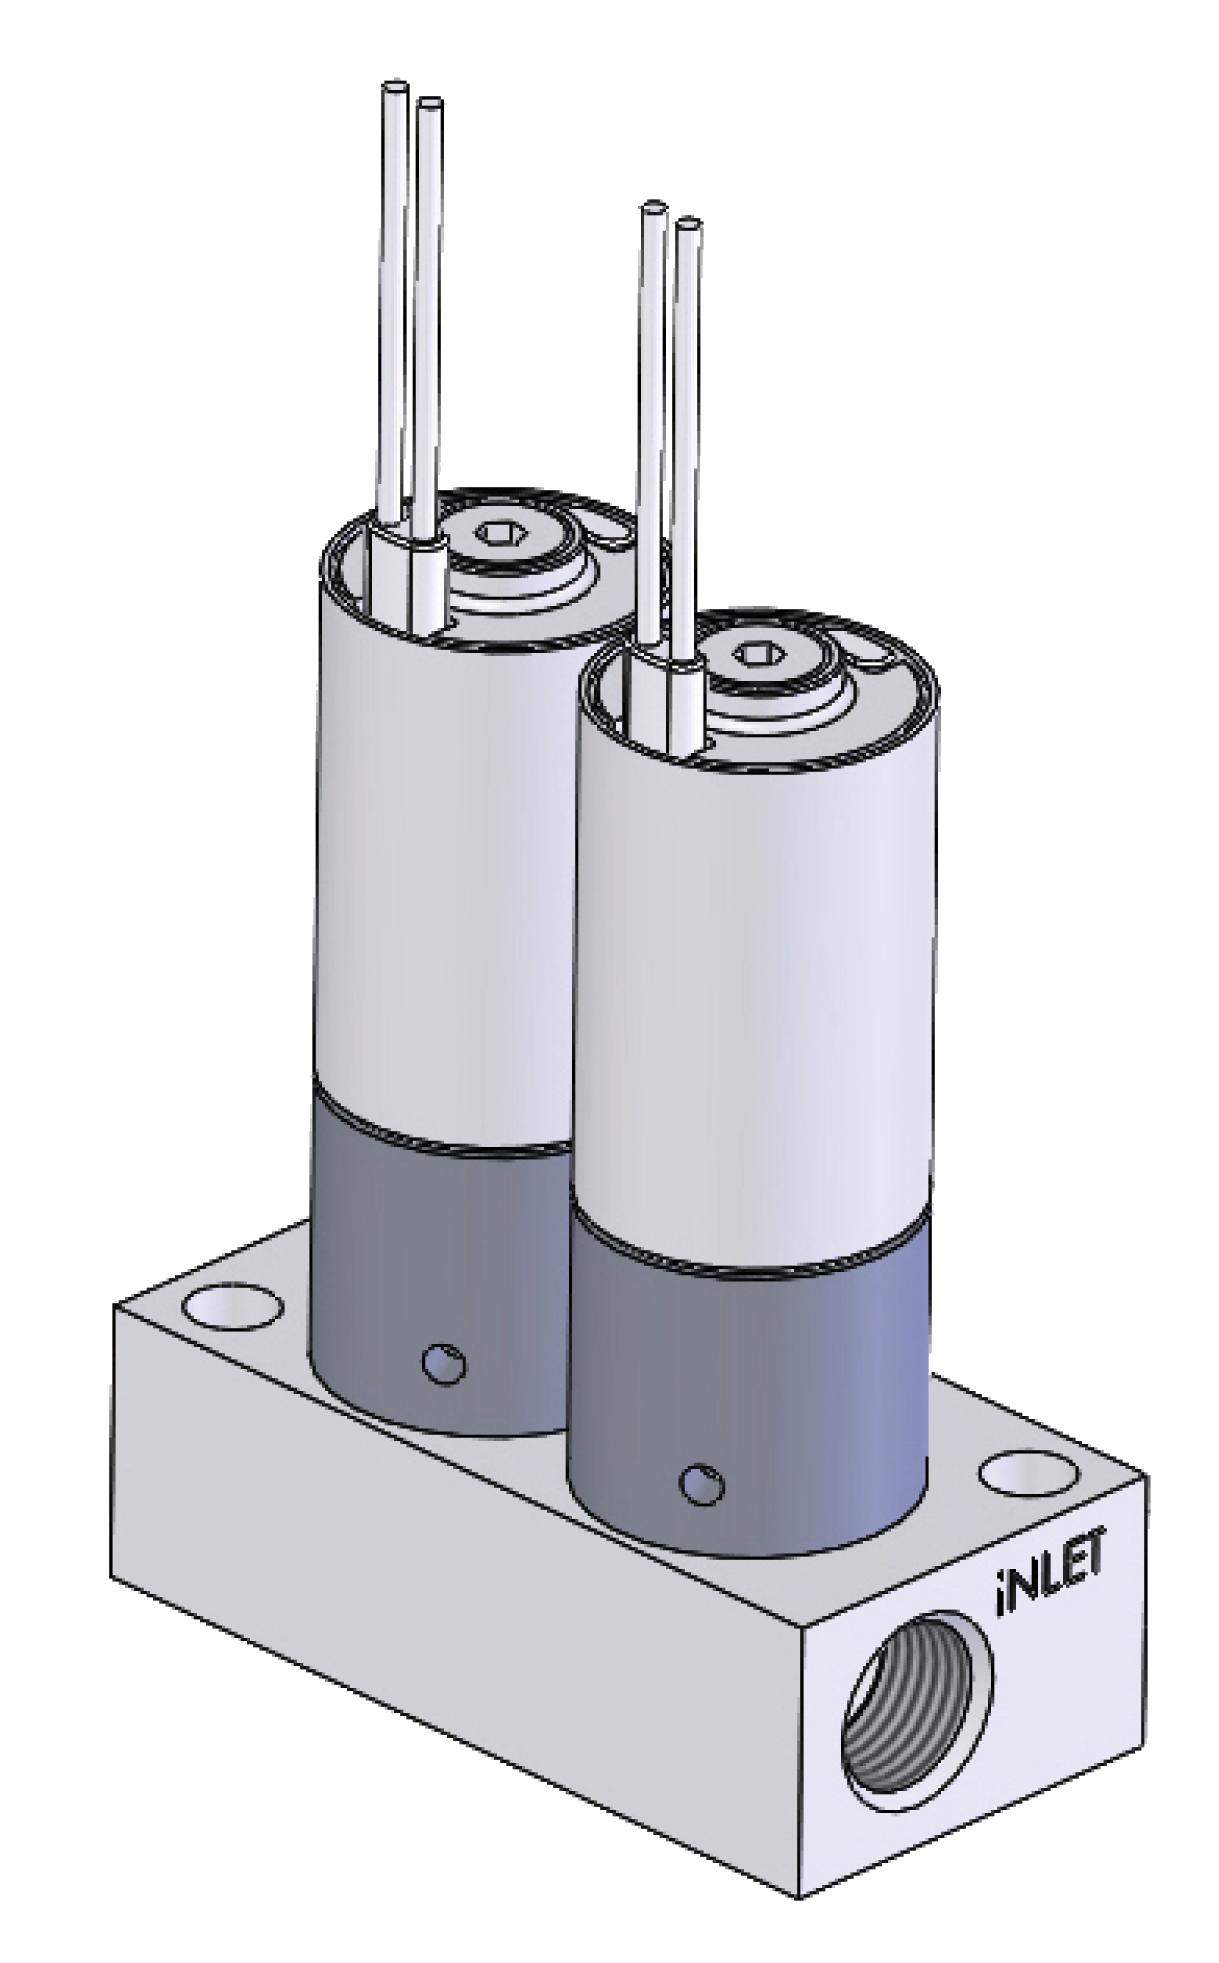 Clippard DVP Series High Flow Proportional Control Valves